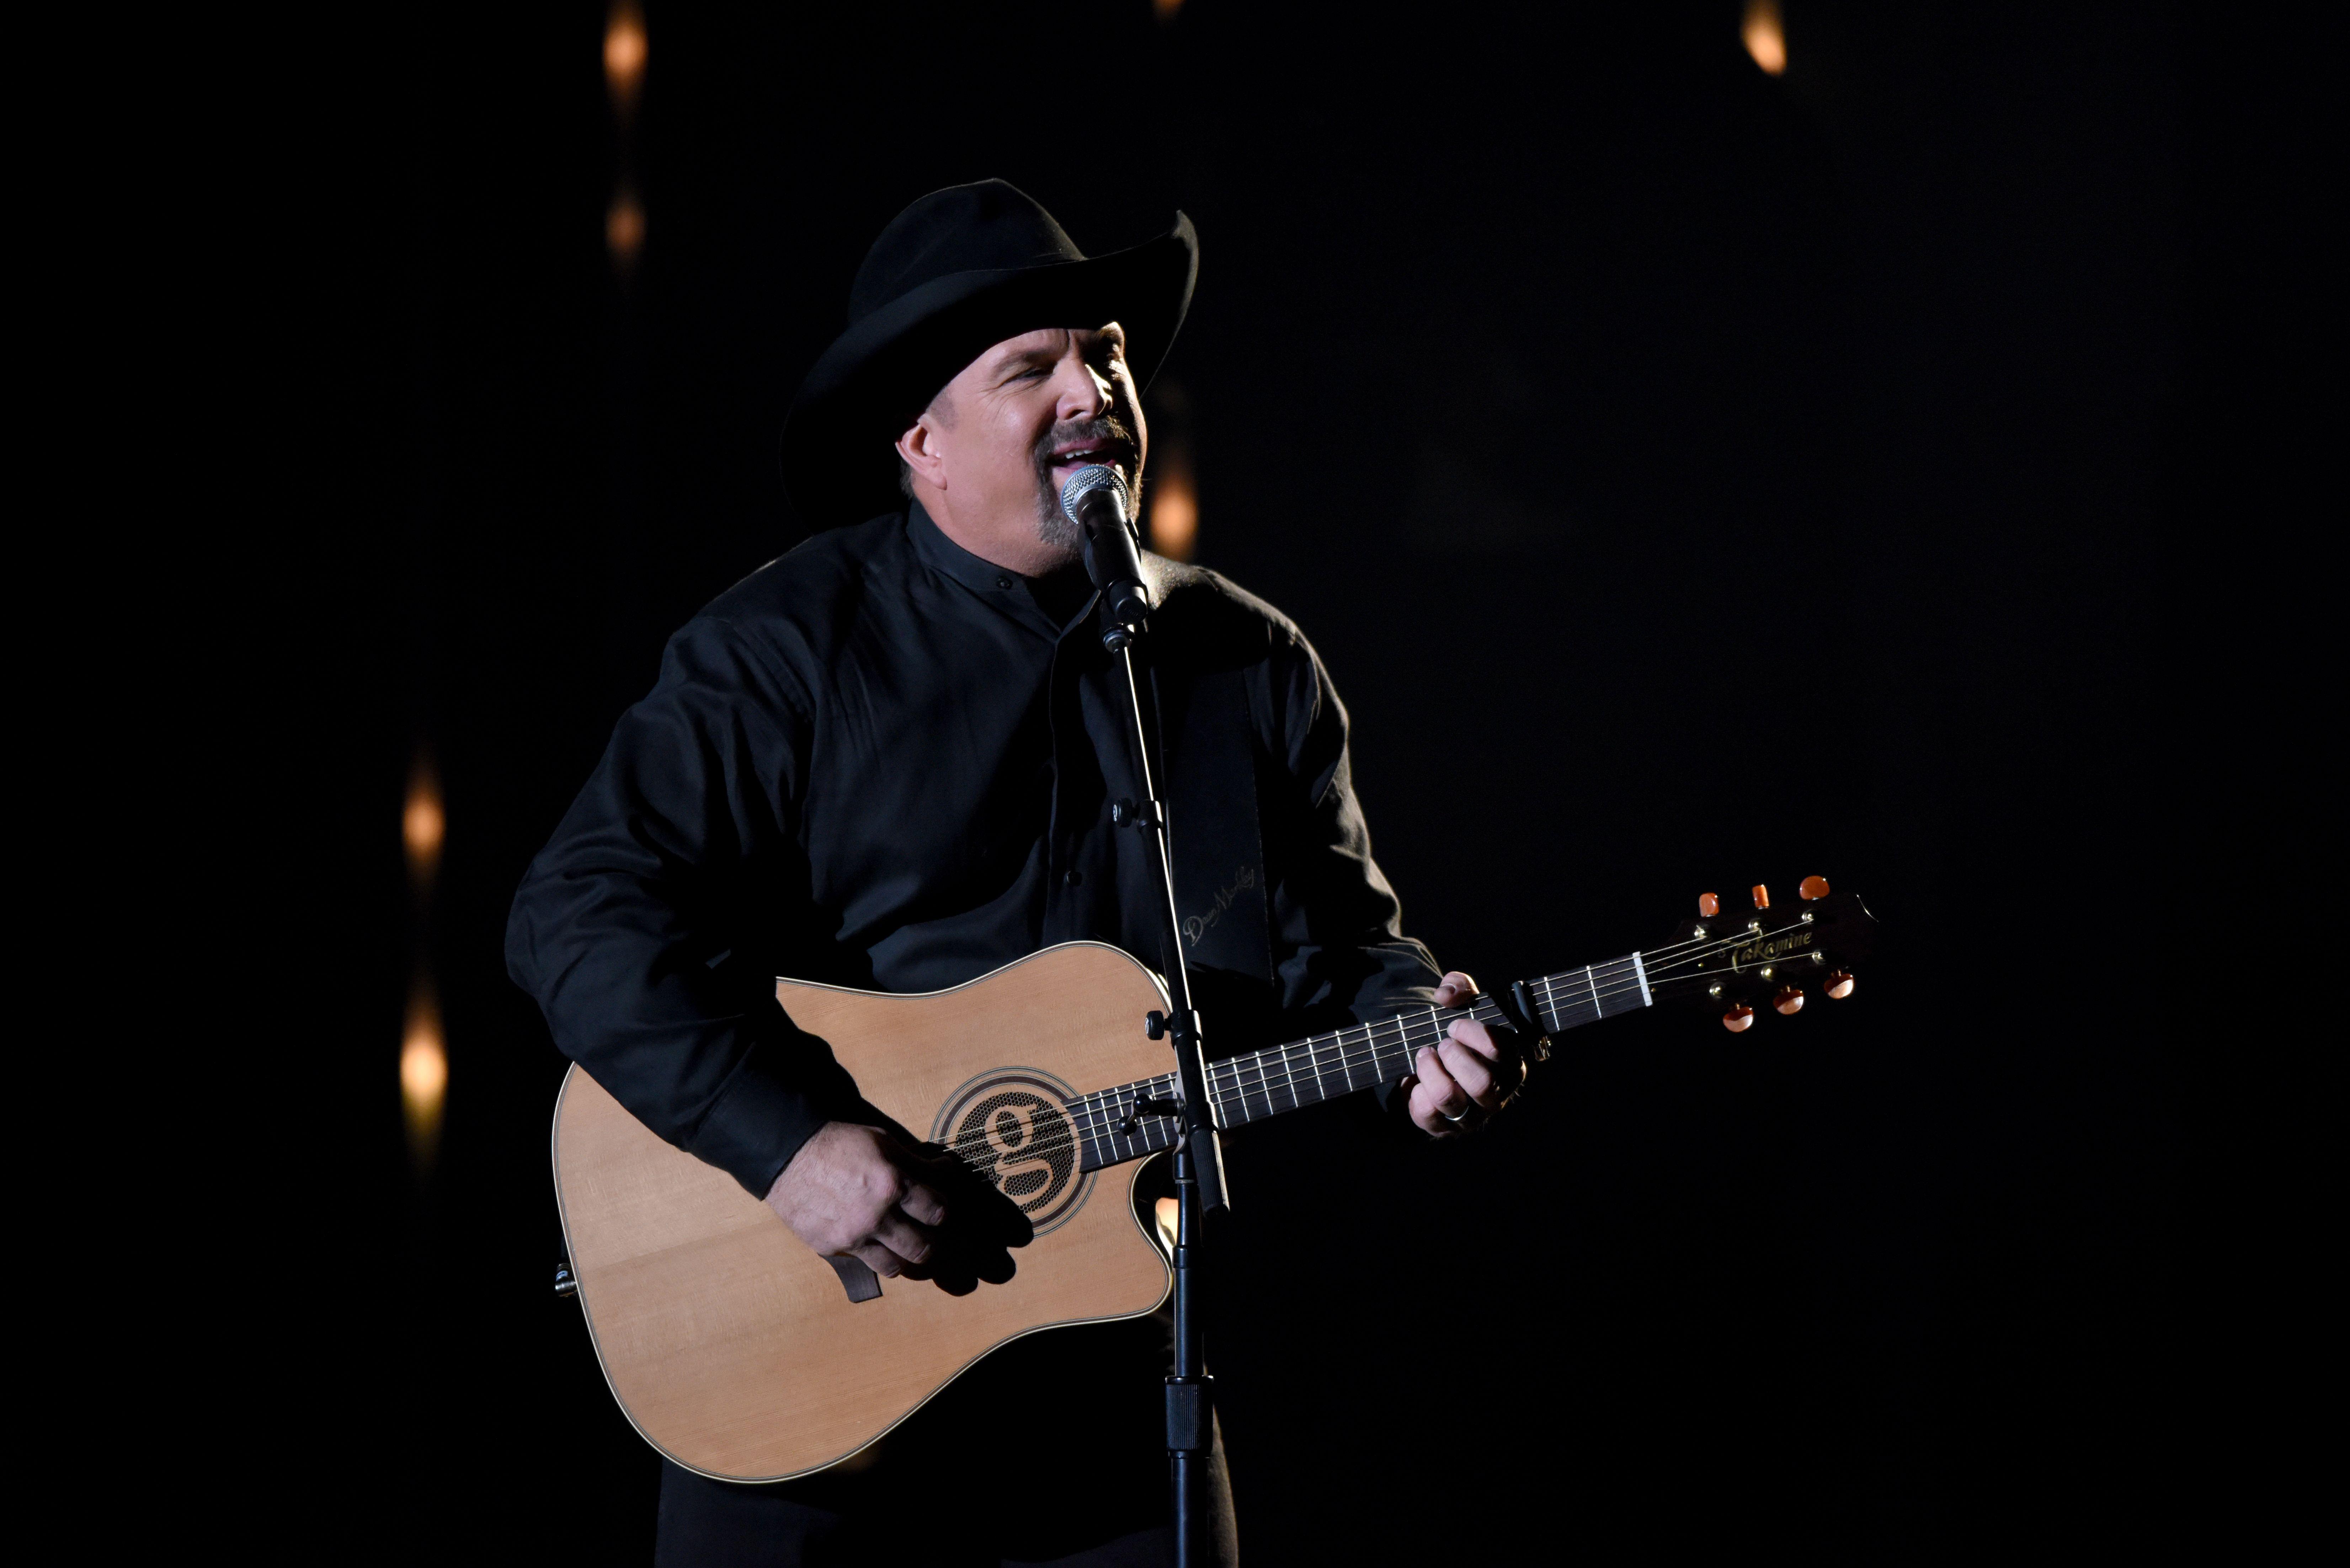 See Garth Brooks' Emotional 'Stronger Than Me' at CMA Awards